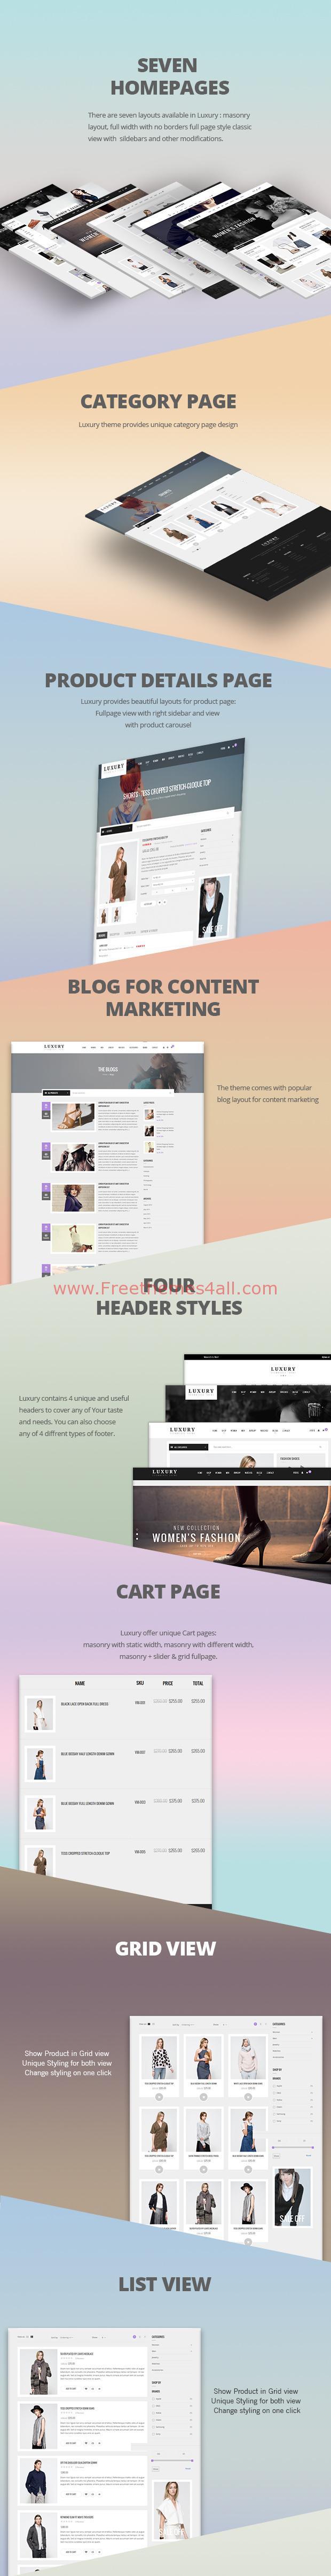 free responsive zen cart templates - premium luxury responsive zencart template freethemes4all